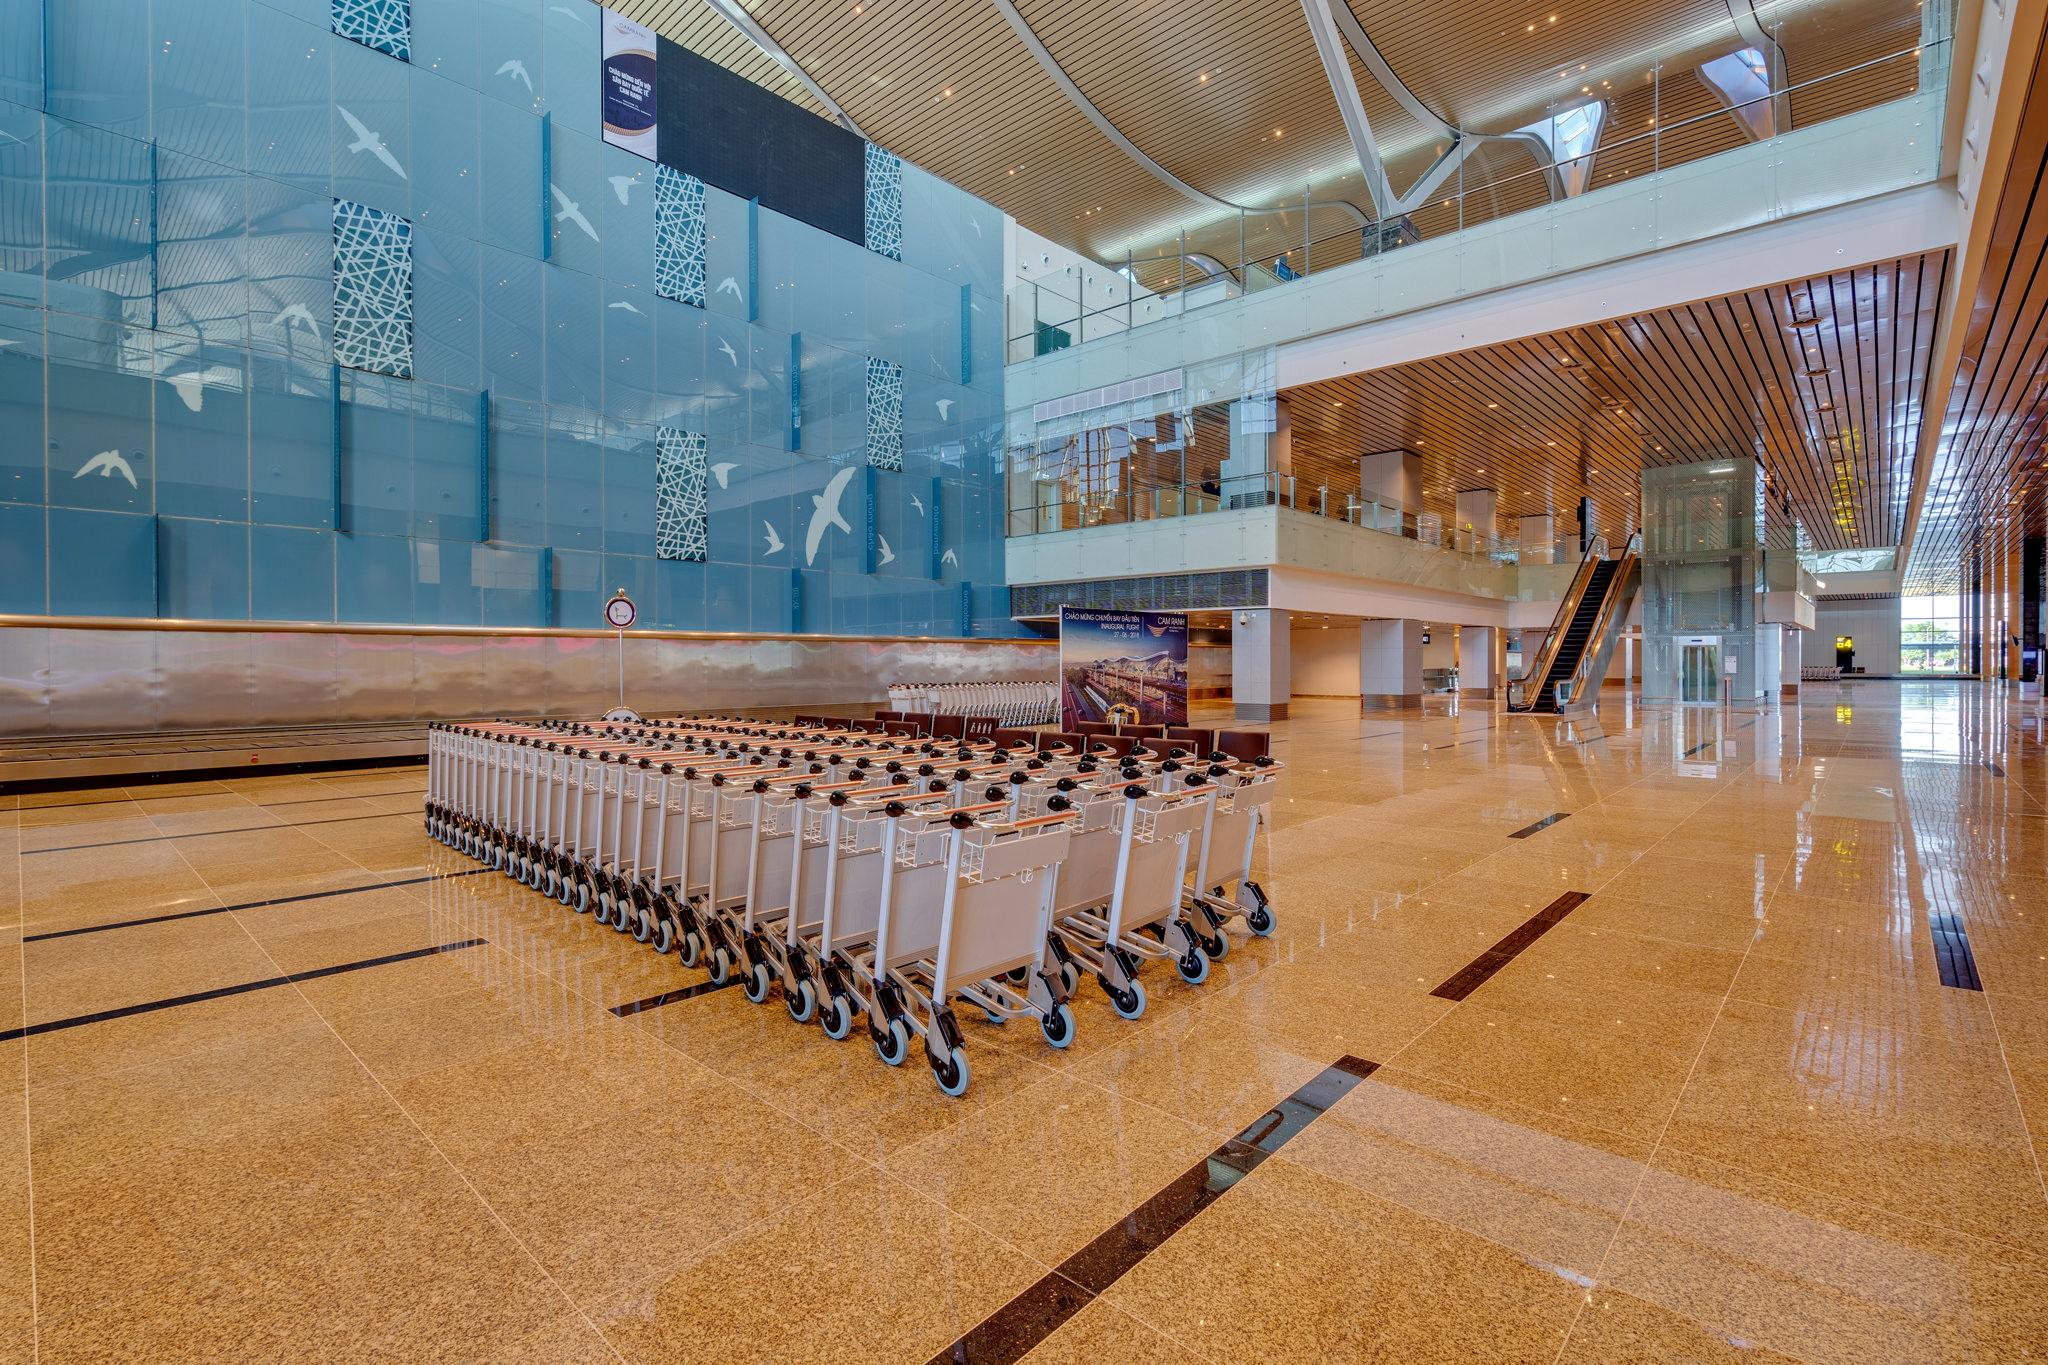 20180626 - Cam Ranh Airport - Architecture - 0125.jpg